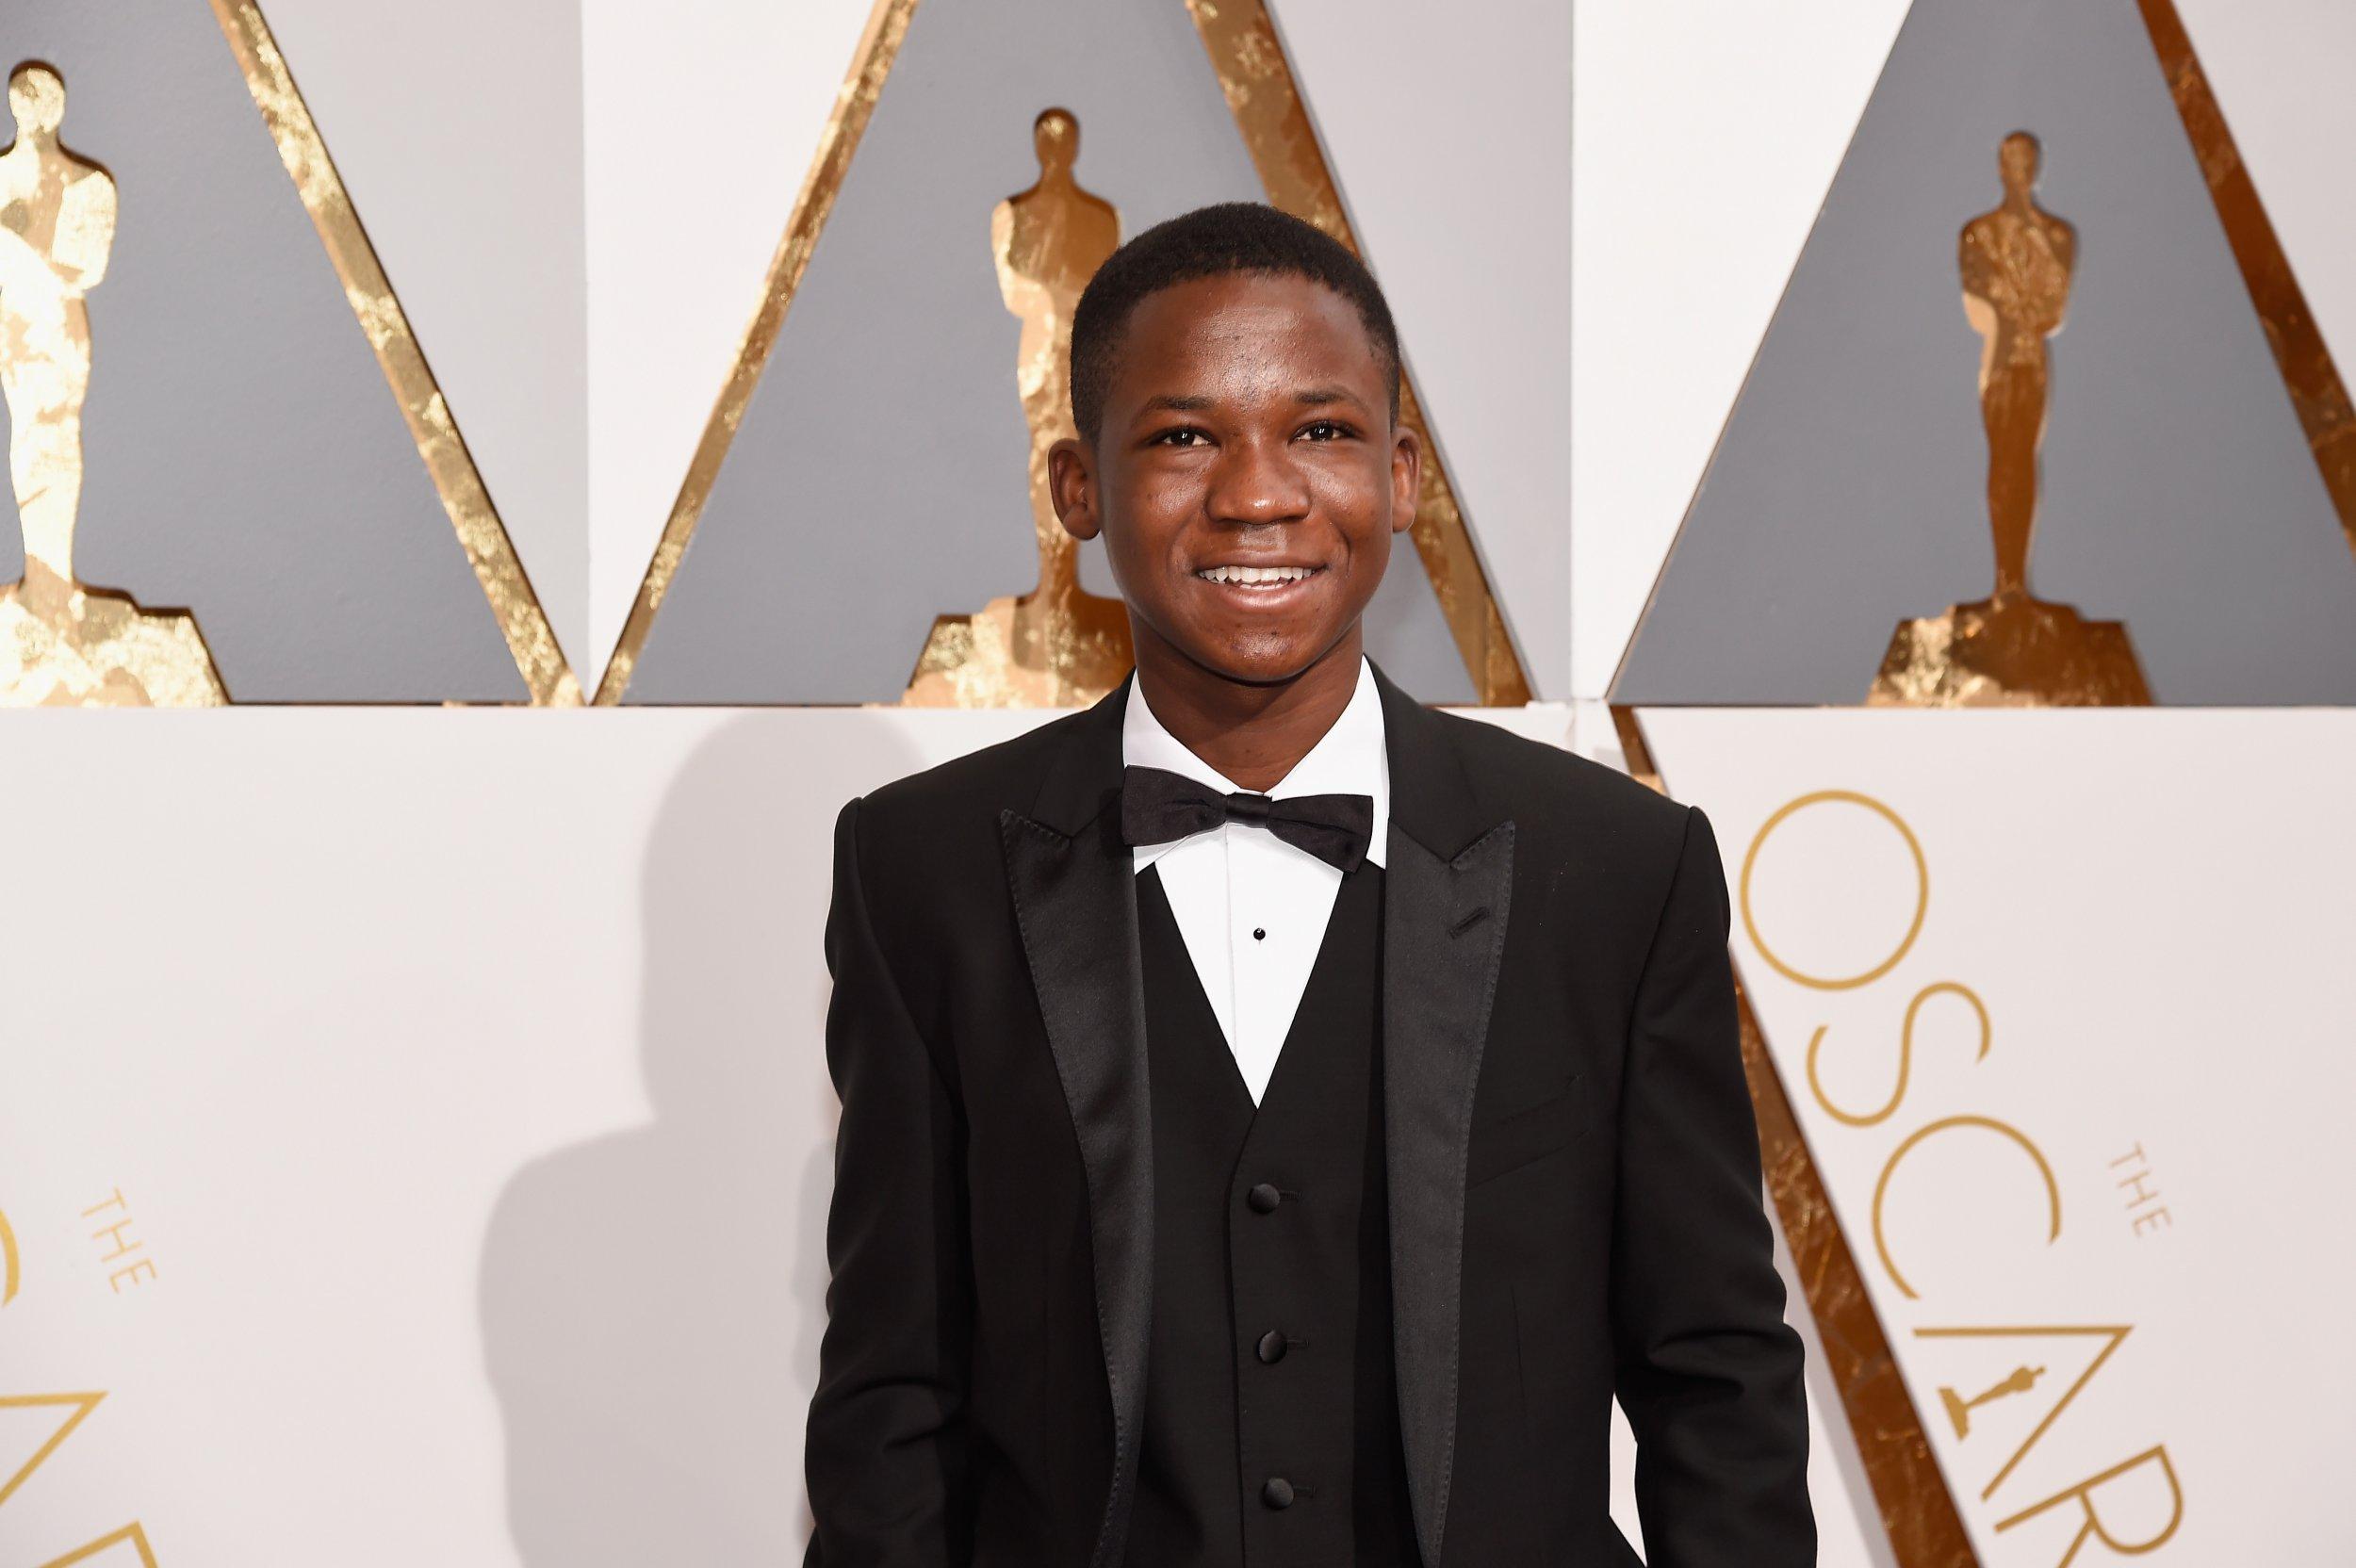 Abraham Attah at the Oscars